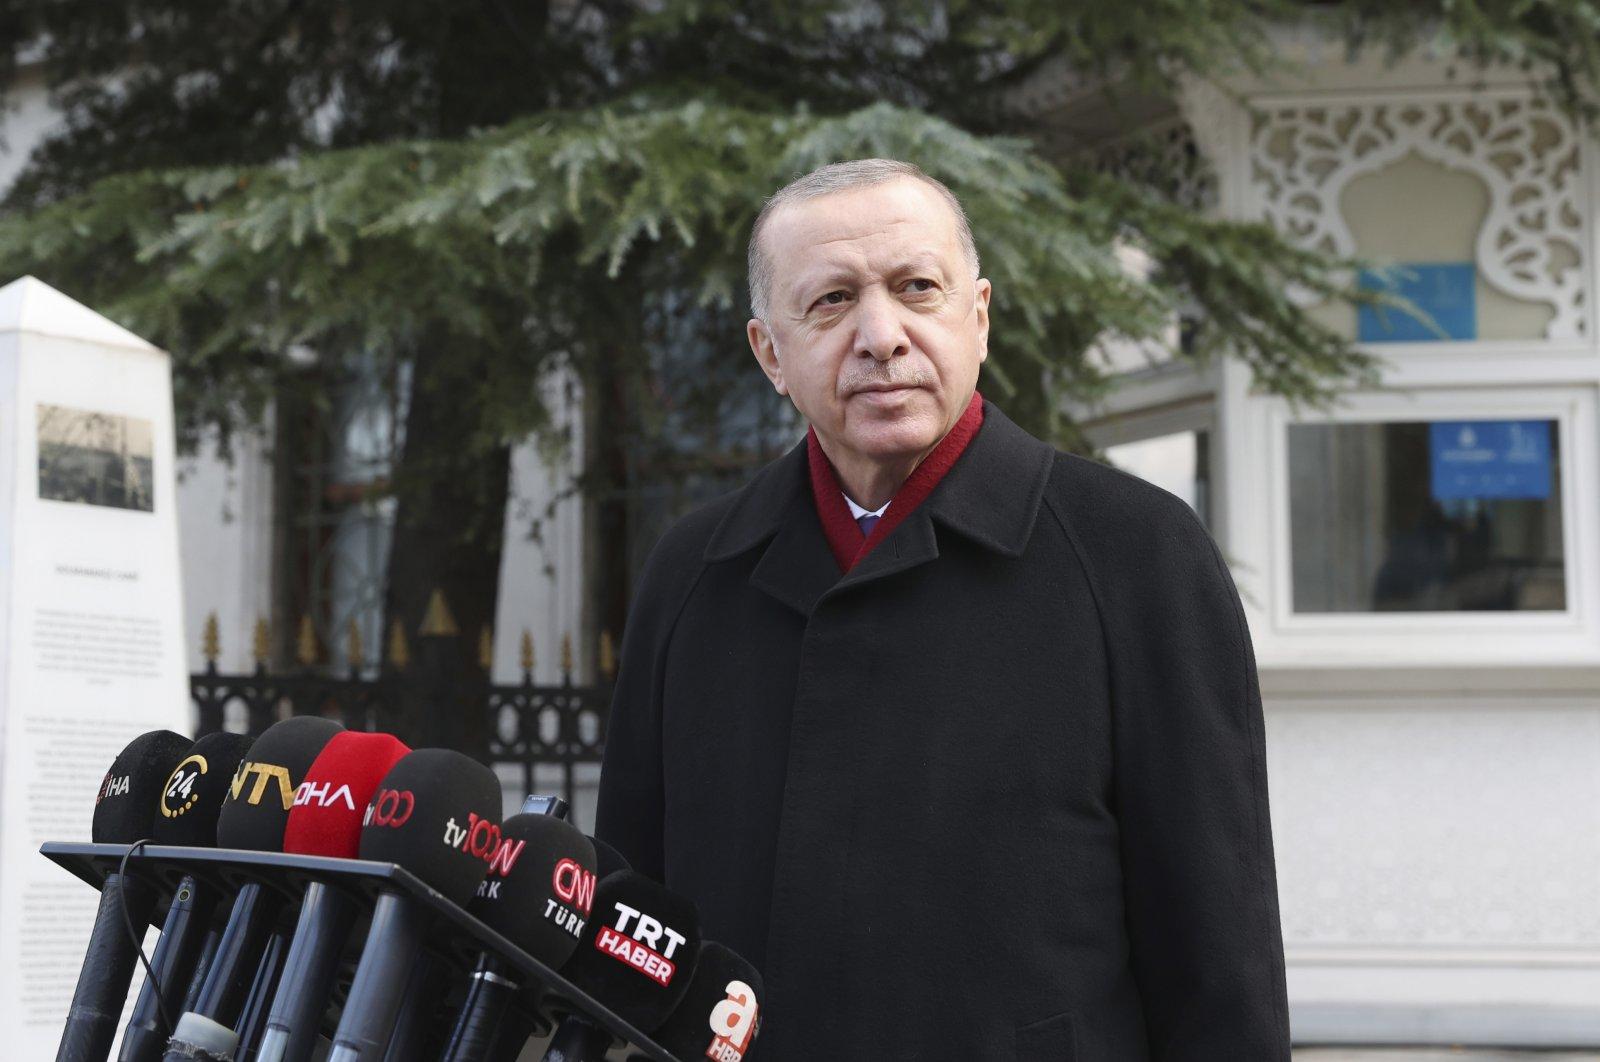 President Recep Tayyip Erdoğan speaks to the media after Friday prayers, in Istanbul, Jan. 15, 2021. (AP Photo)